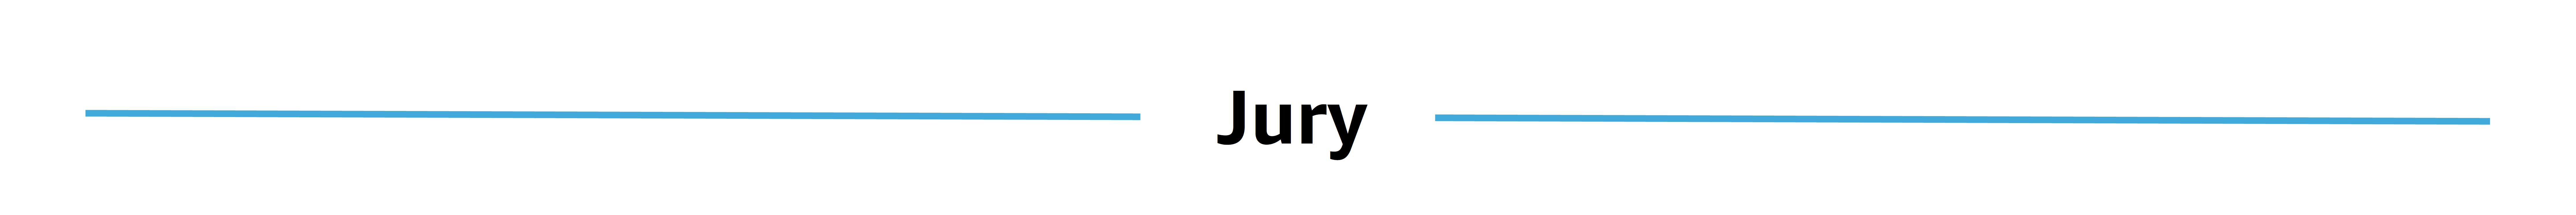 banner jury title